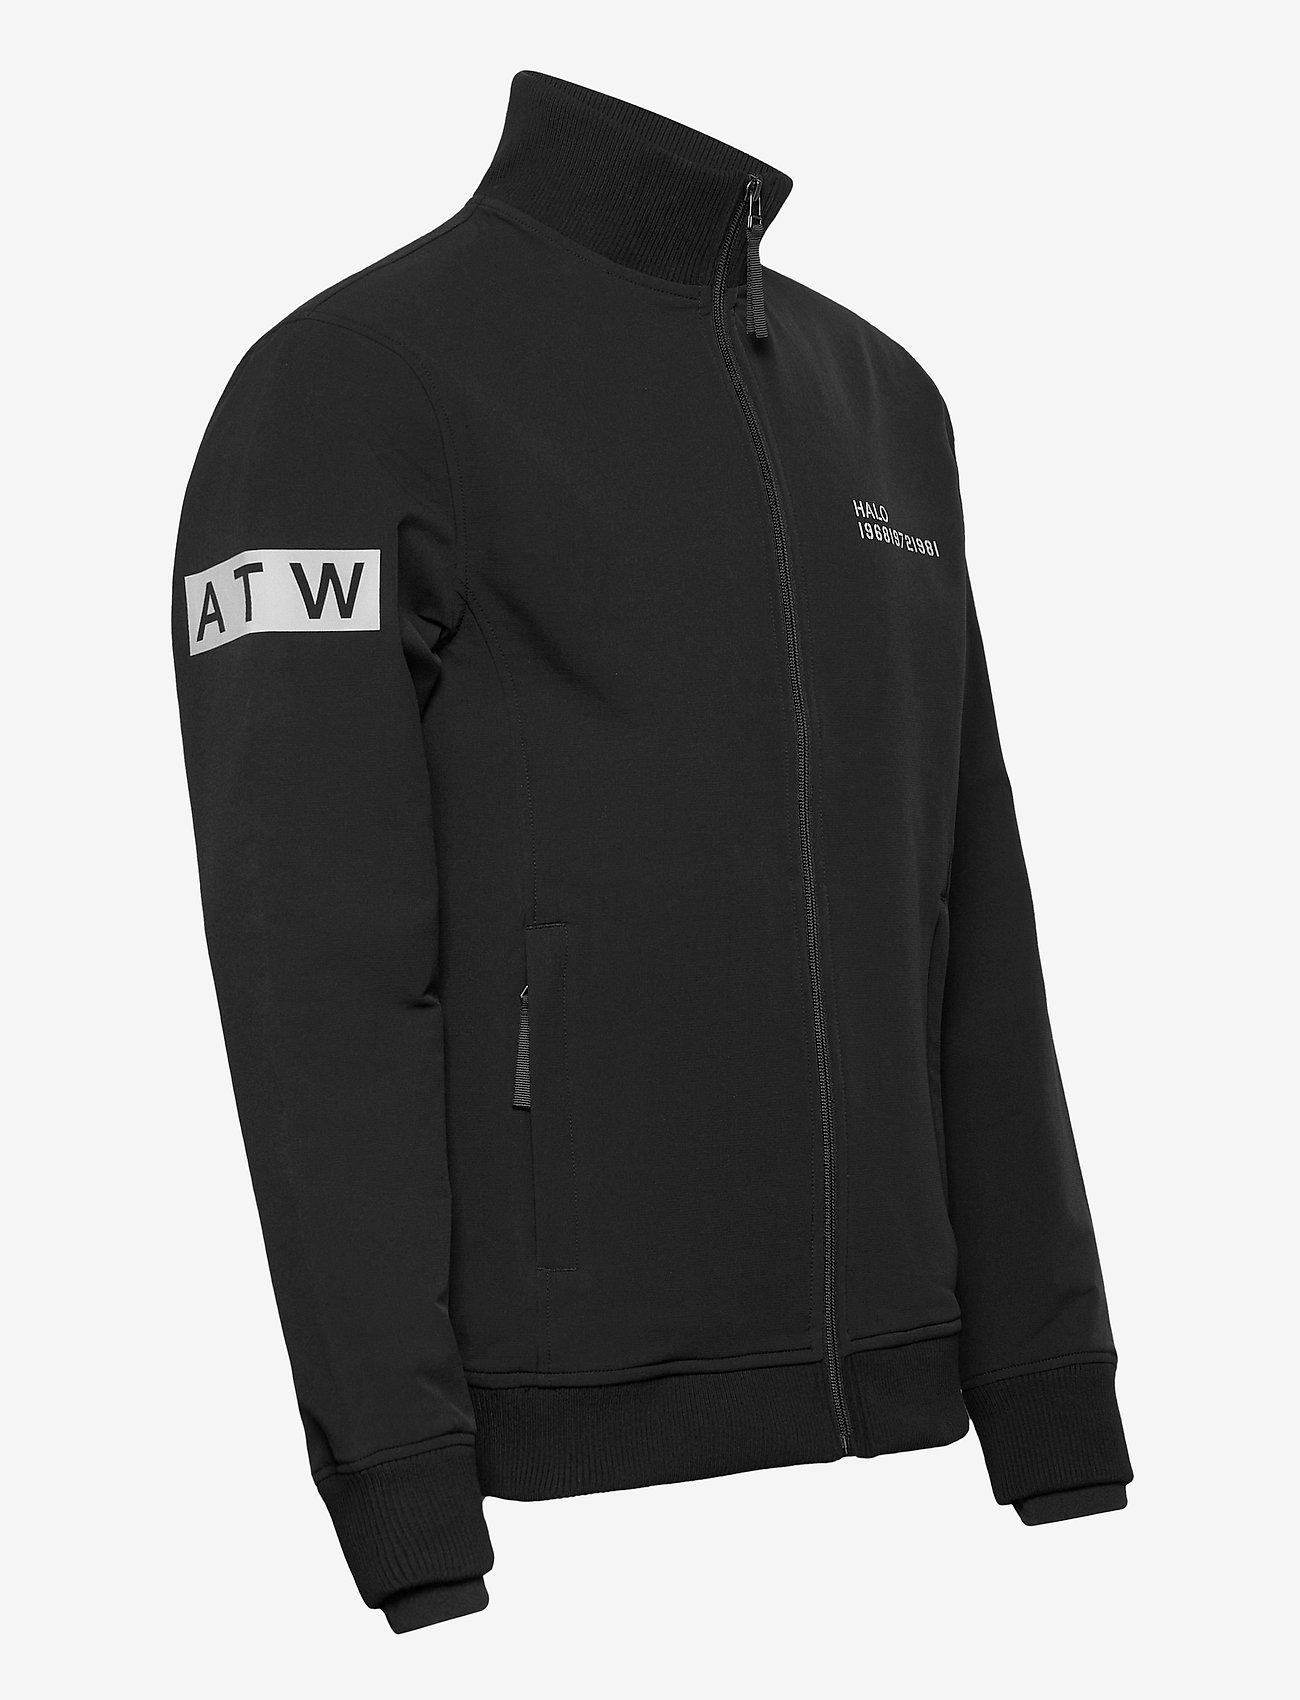 Halo Zip Jacket (Black) (240 €) - HALO zpDlO